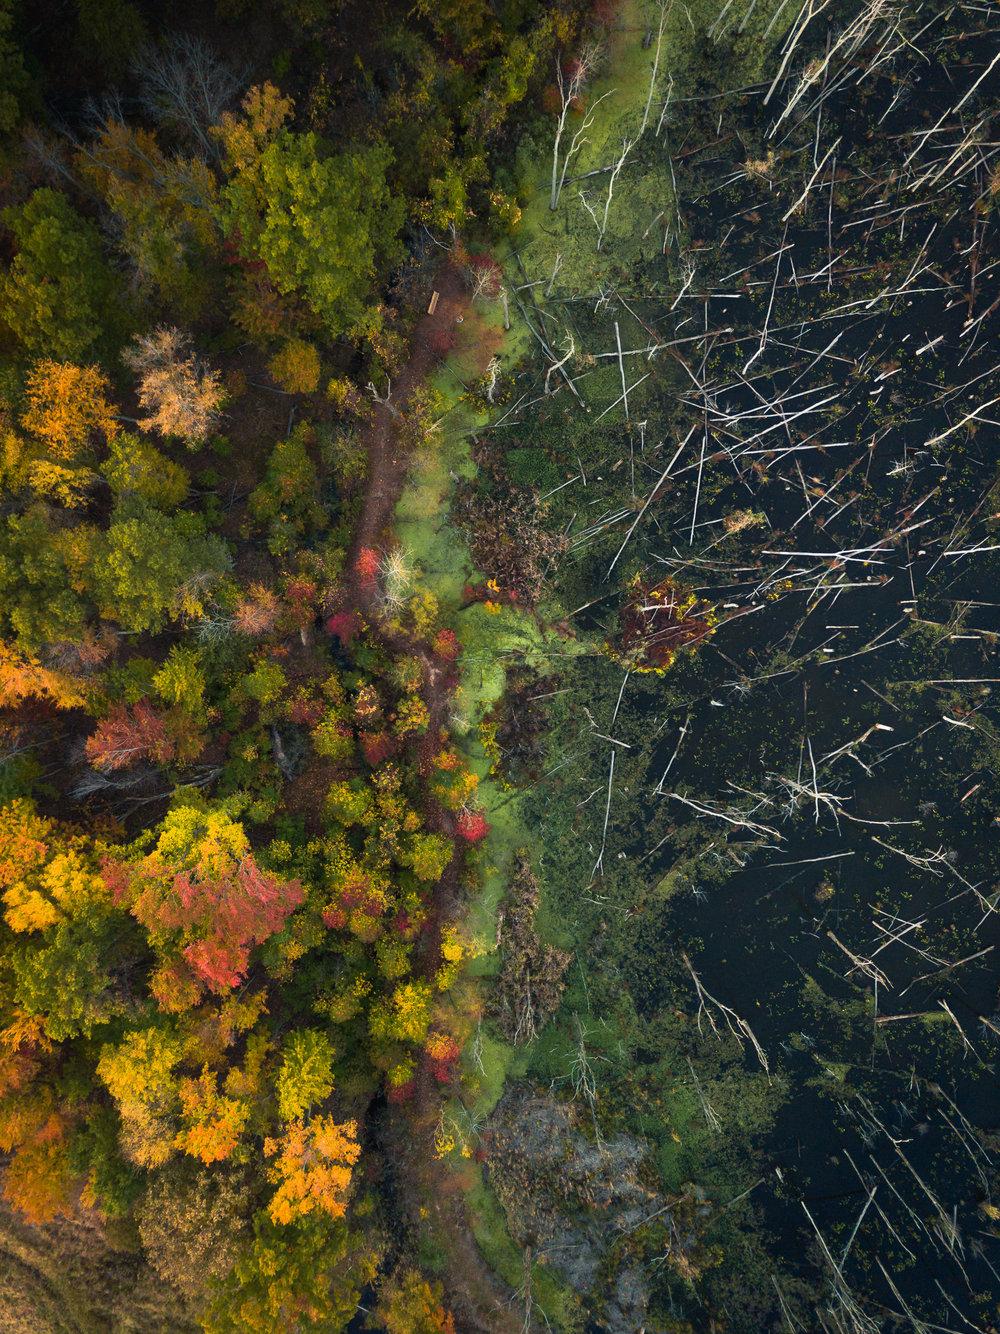 treesdown_typoland_aerial-1.jpg